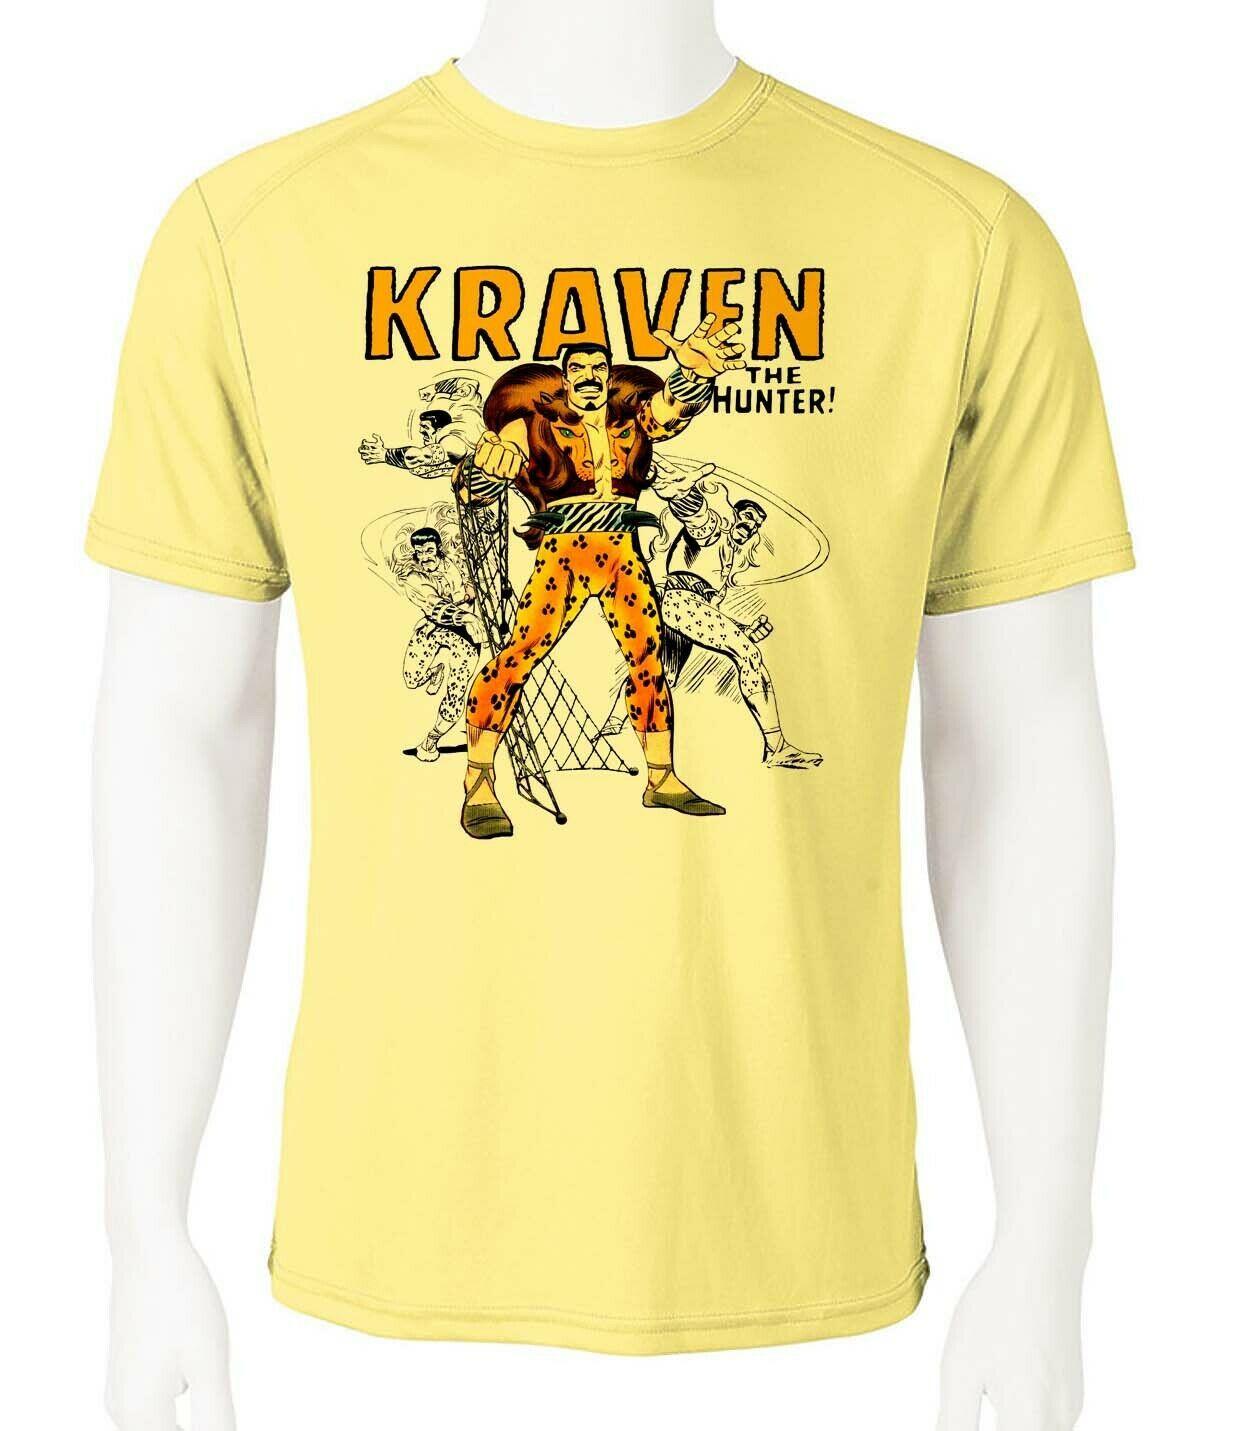 Kraven the hunter 2 comic tshirt for sale online